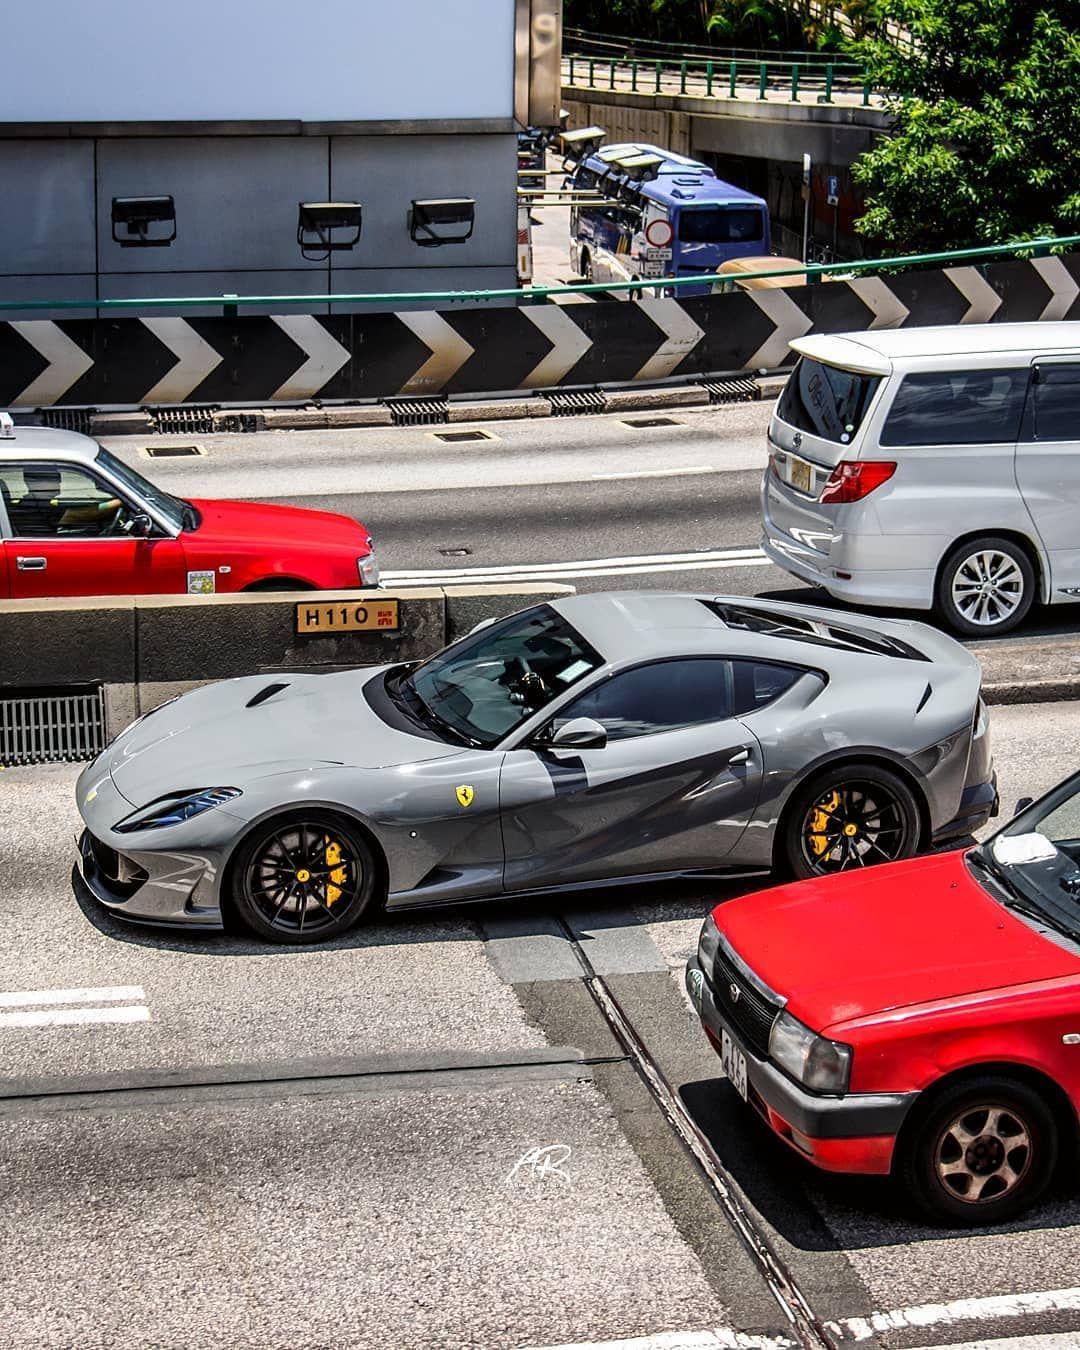 Ferrari F12 Vs 812 : ferrari, Nardo, Ferrari, Superfast, @supercarsofhongkong, ______, Featured?, #thesupercarlifestyle, Follow, @t…, Grey,, Ferrari,, Sports